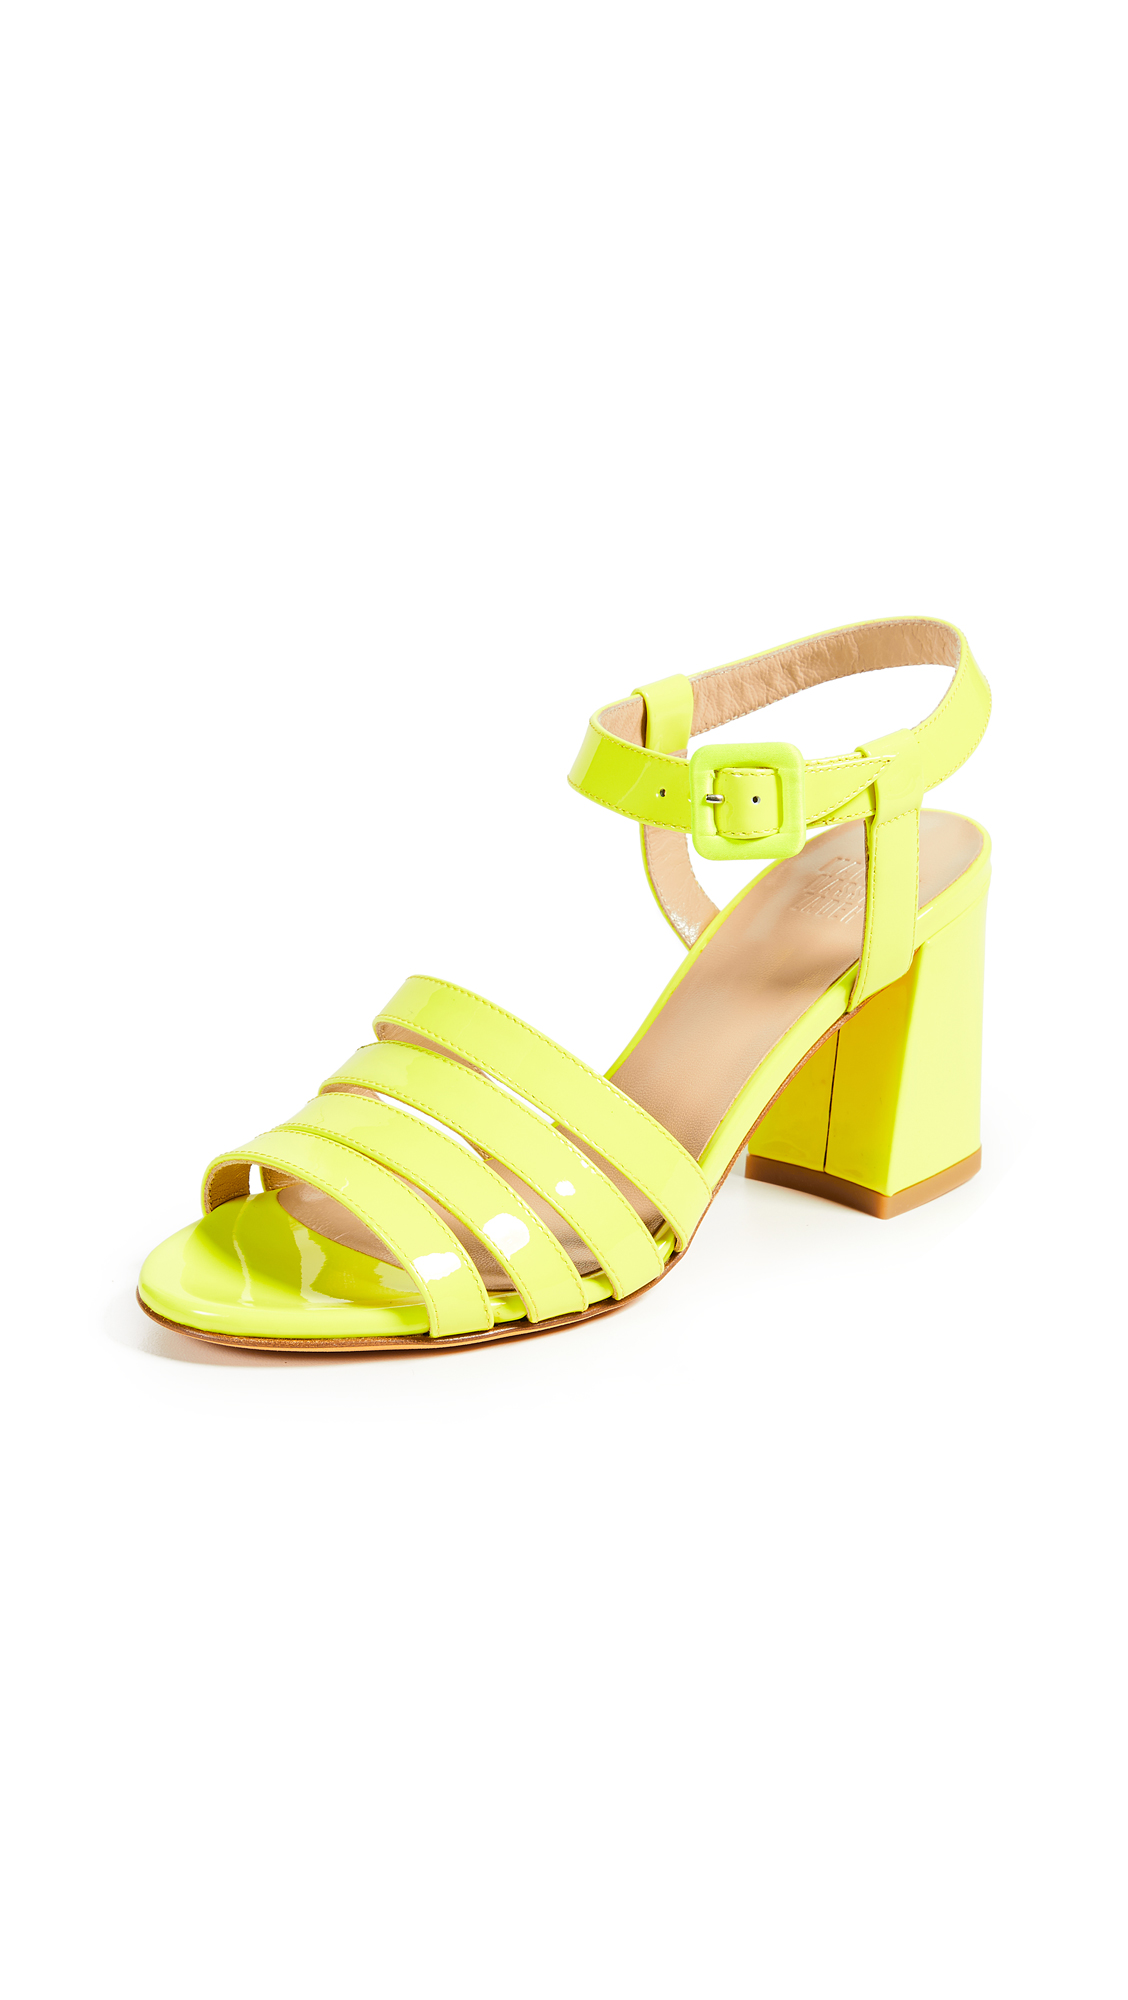 Maryam Nassir Zadeh Palma Sandals - Neon Yellow